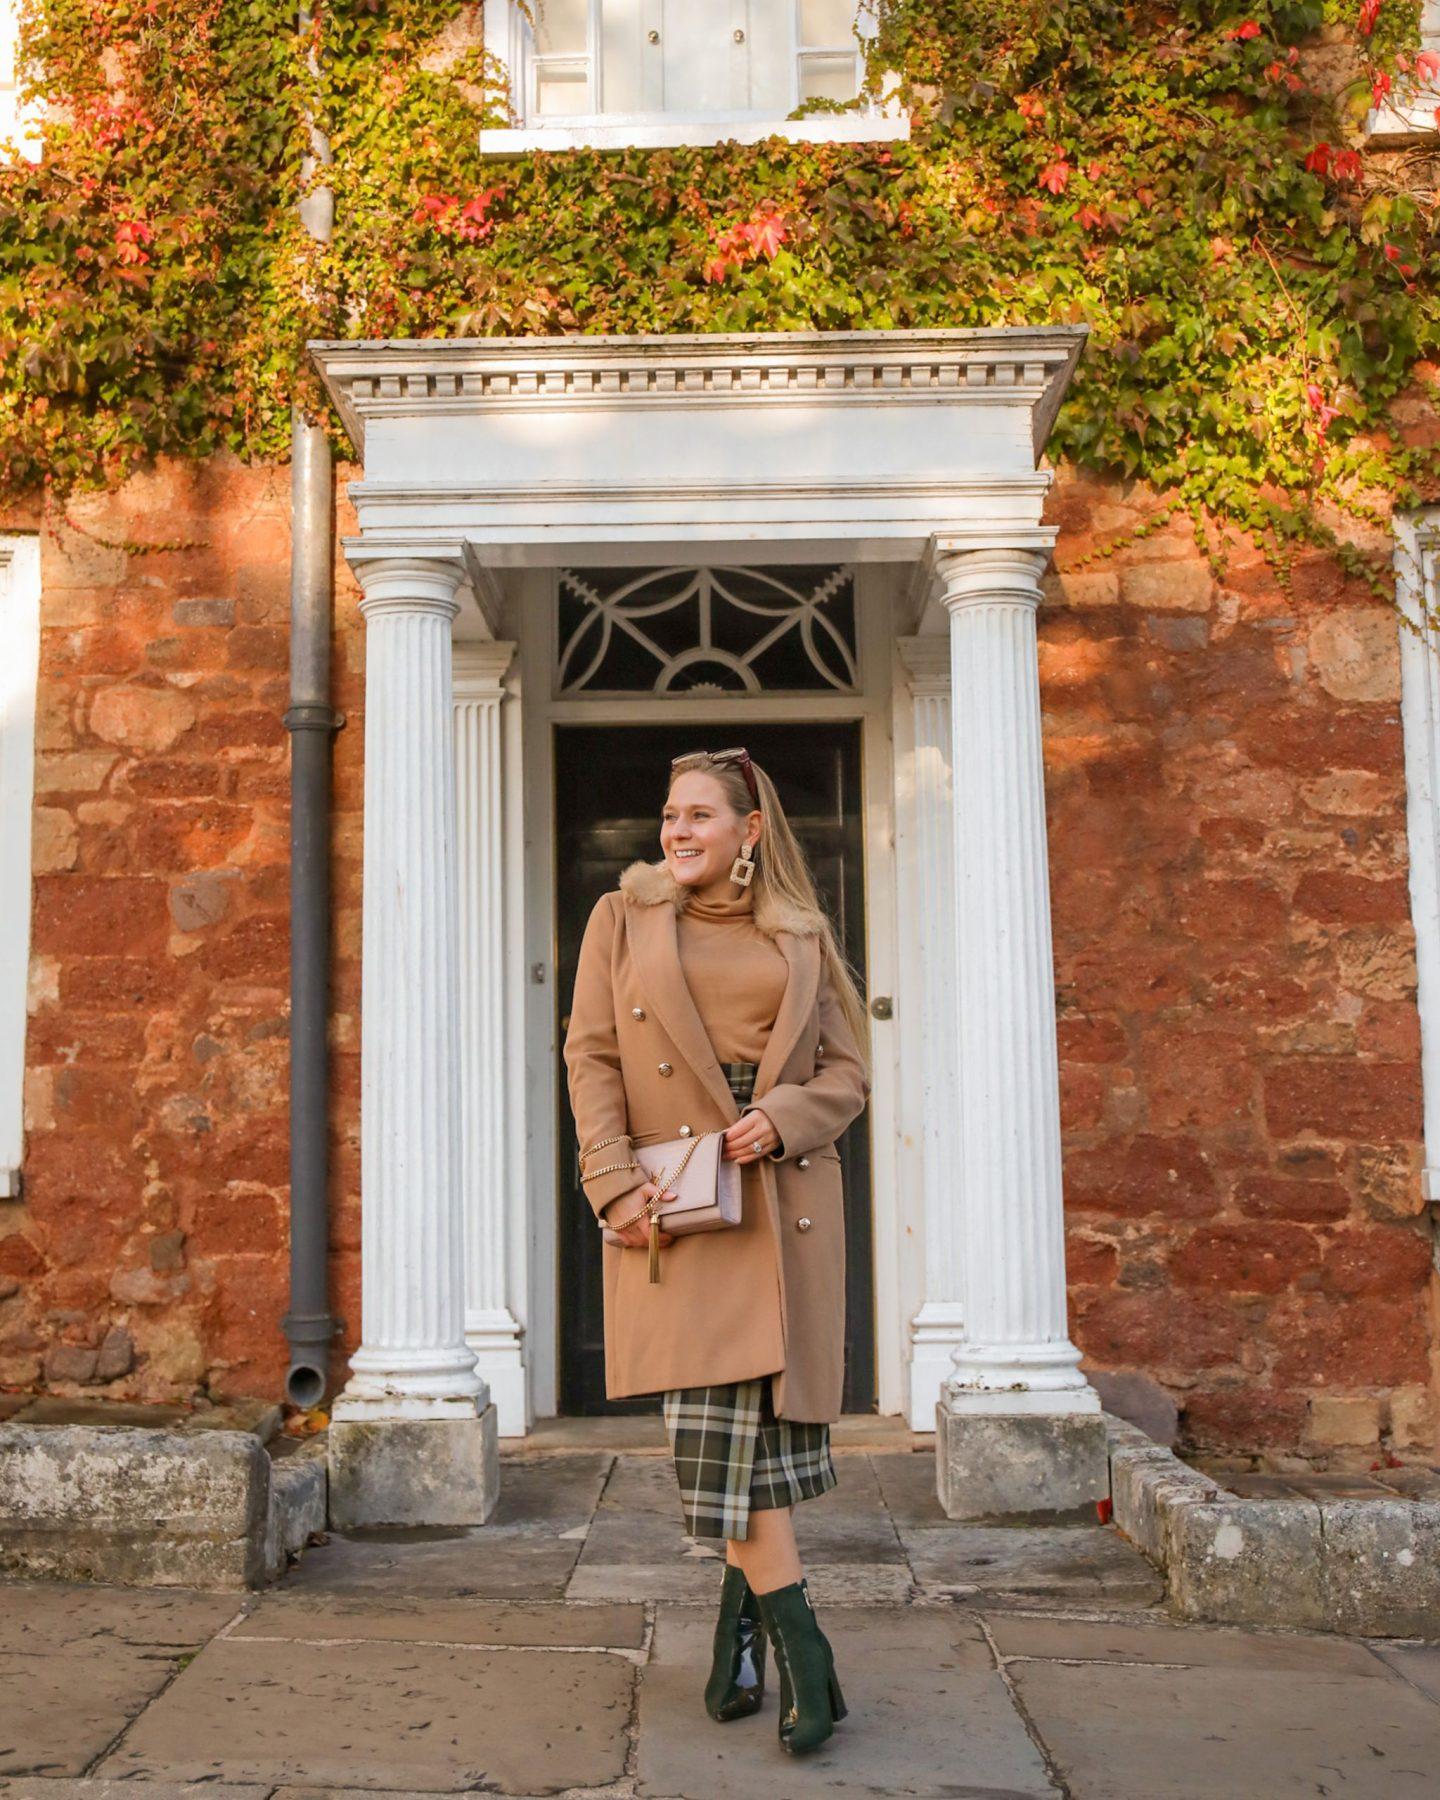 Camel Top and Tartan Skirt for autumn, Katie Heath, KALANCHOE